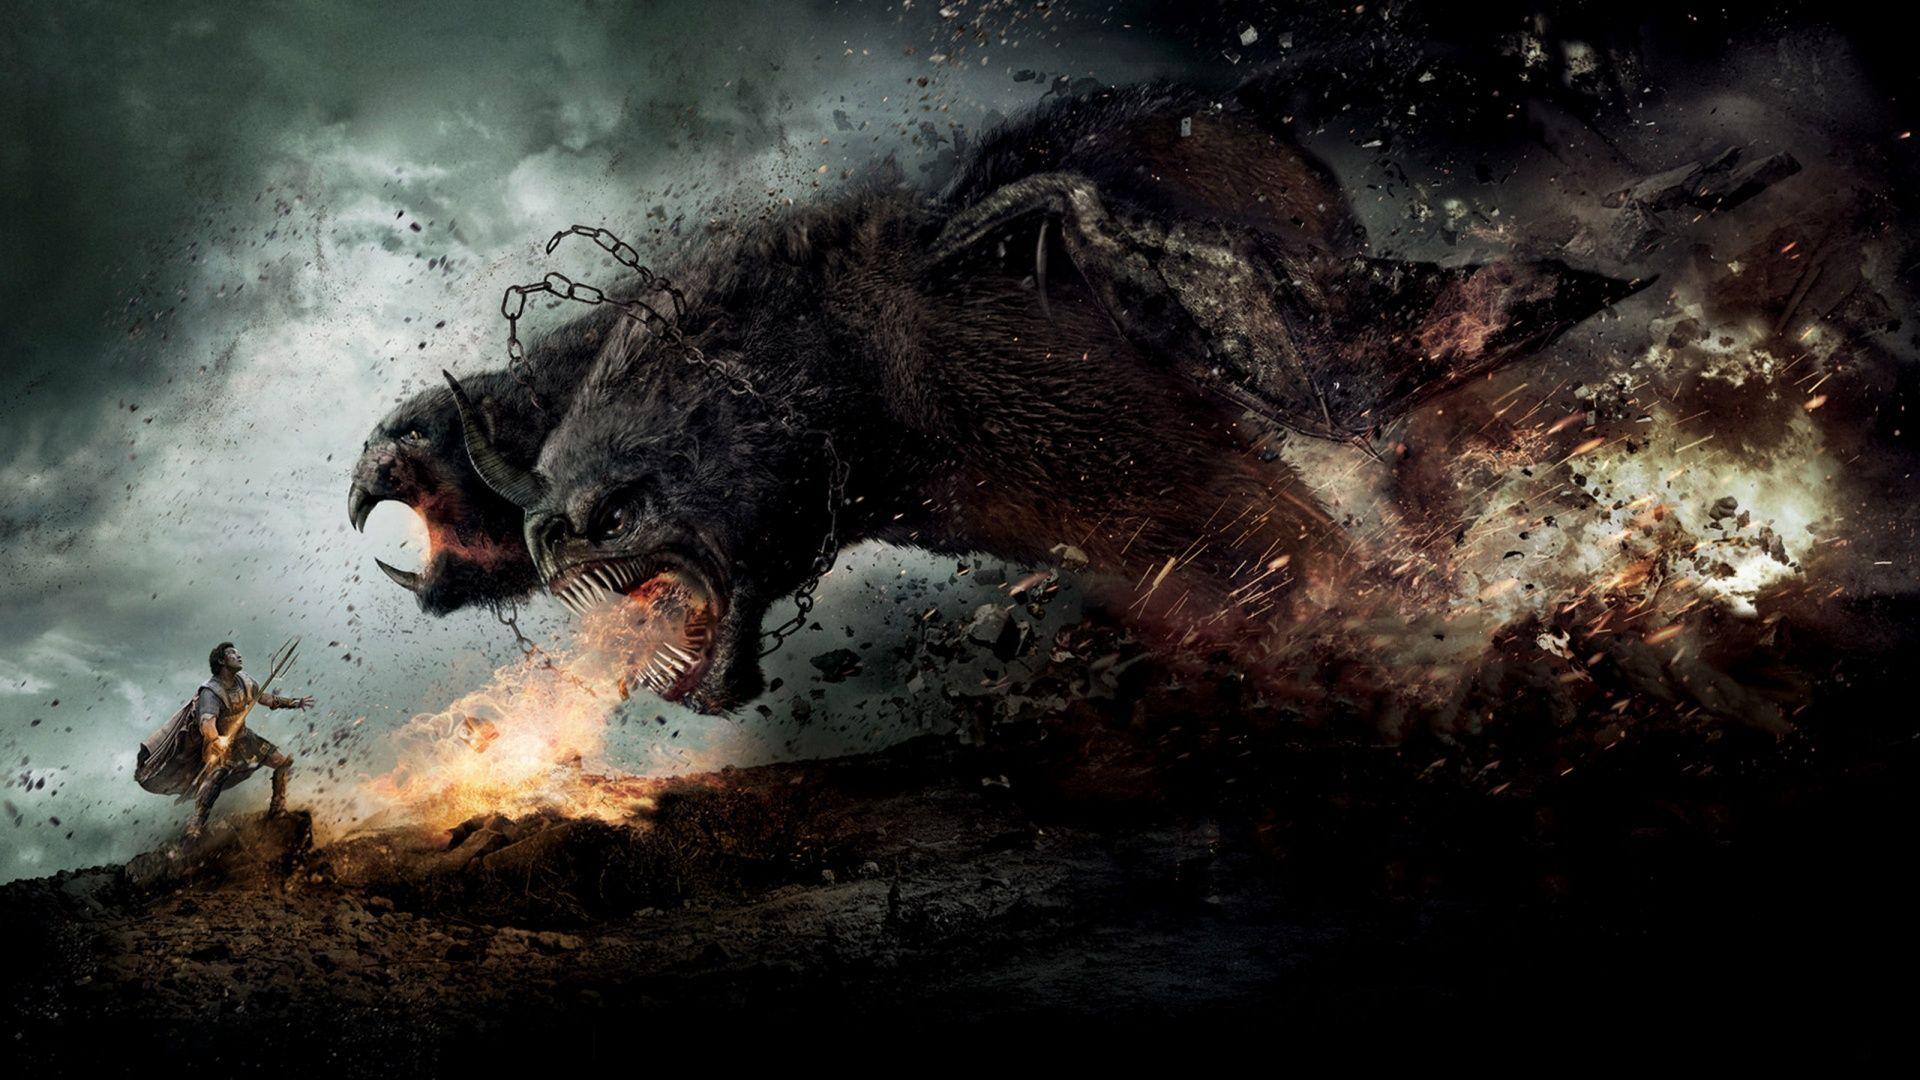 Wrath Of The Titans Wallpaper Wrath Of The Titans Movie